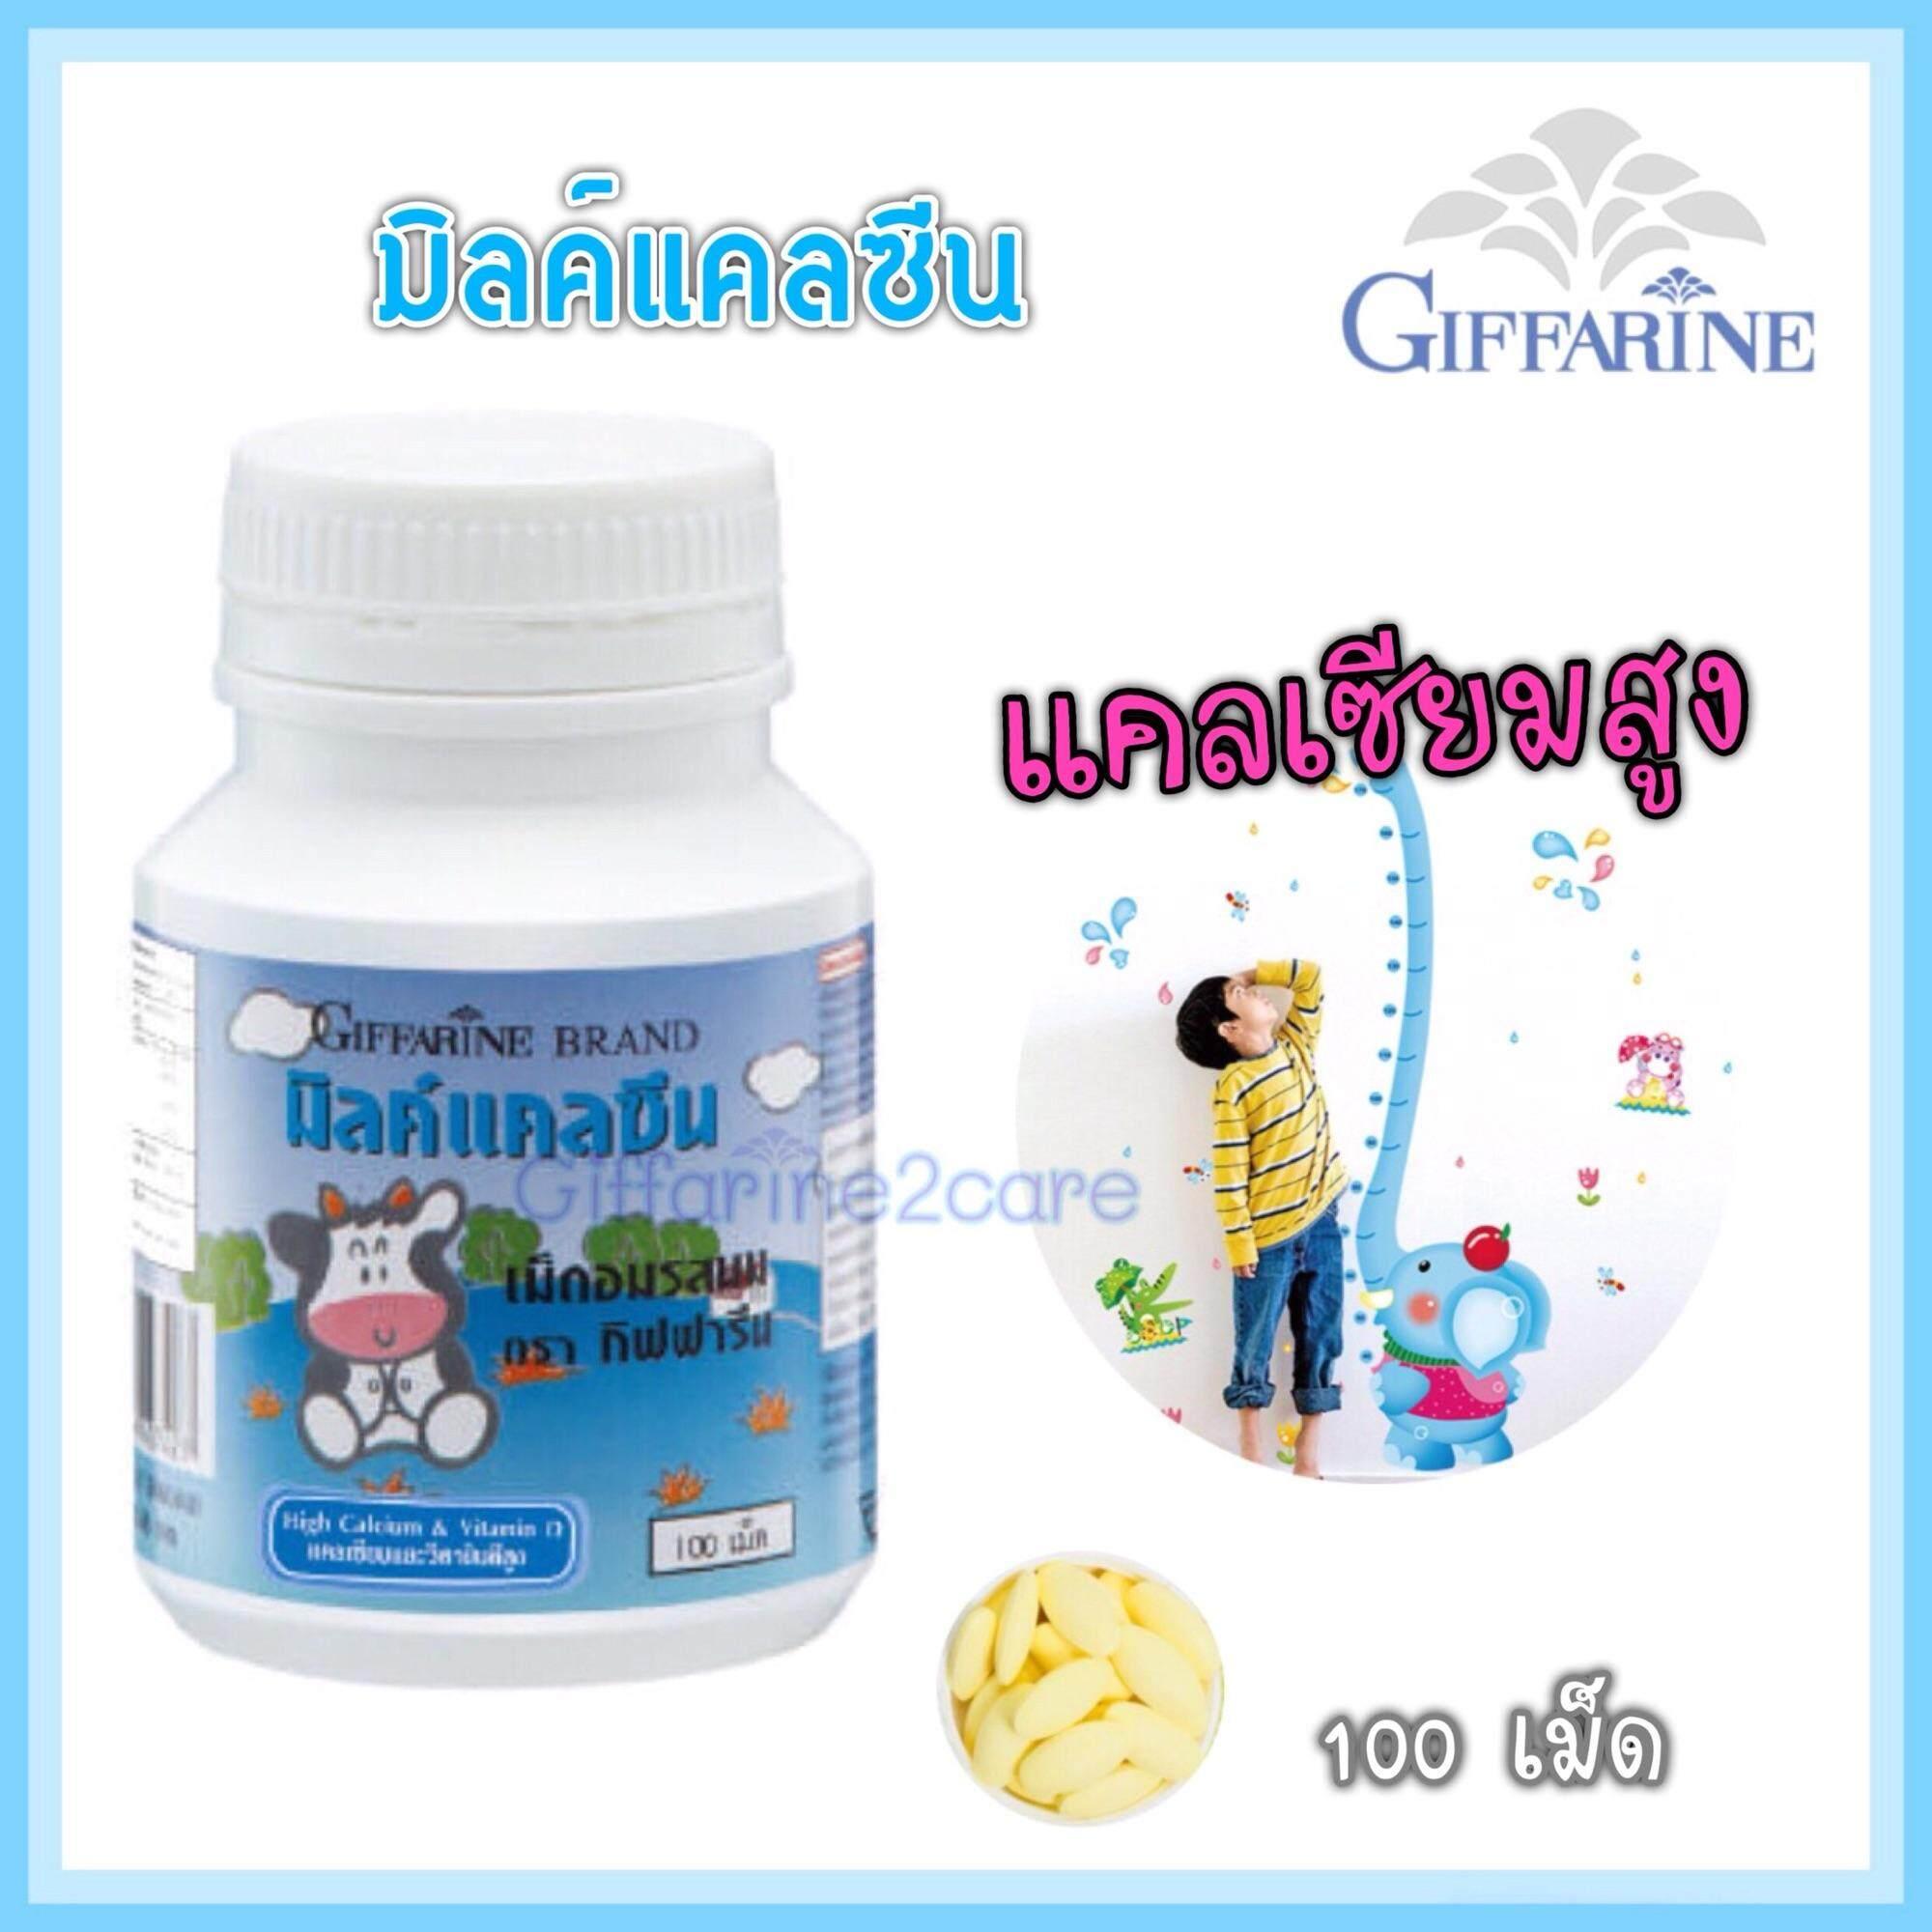 Giffarine Calcine Milk แคลซีน มิลค์ Calcium นมอัดเม็ดเสริมแคลเซียม บำรุงกระดูก เพิ่มส่วนสูง สำหรับเด็ก 100 เม็ด (รสนม) .